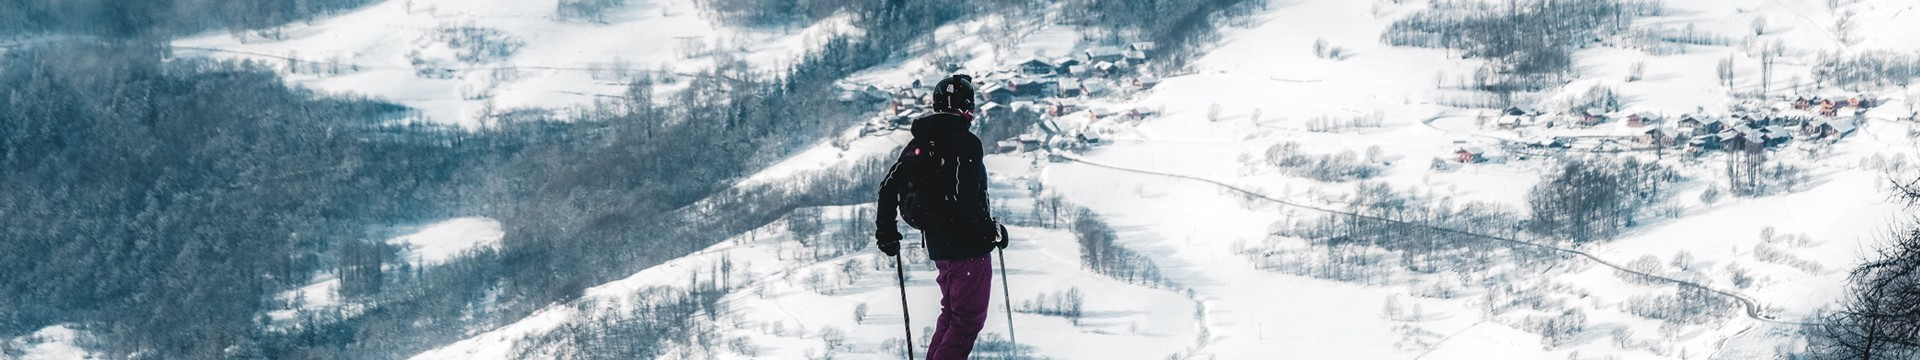 1920x1440-ski-lezbroz-9986